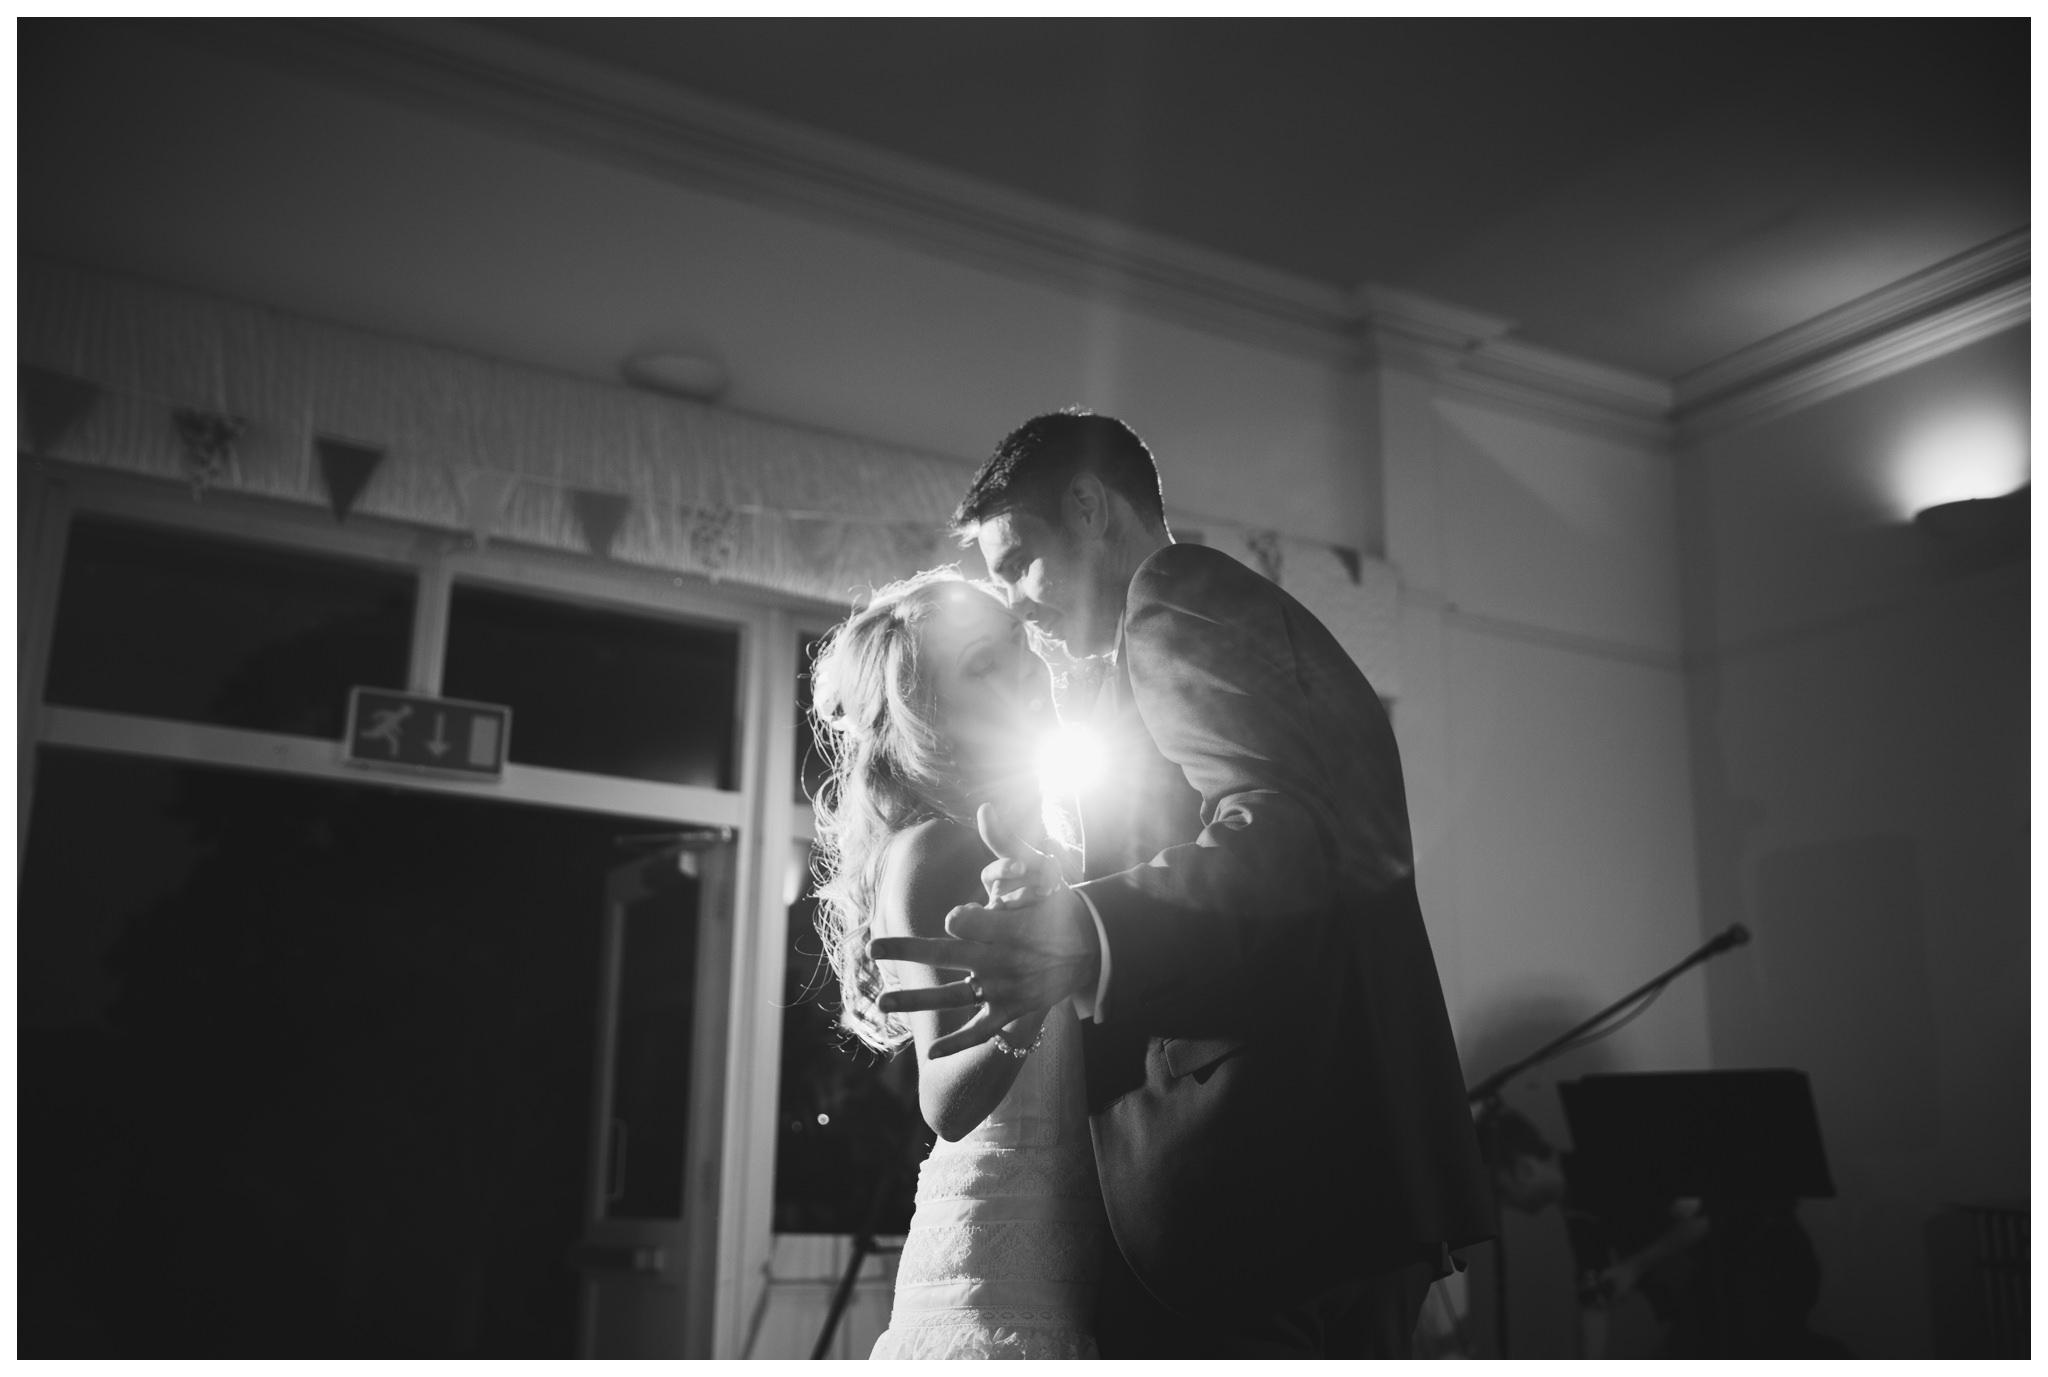 Richard Savage Photography - Wedding - Peterstone Court Brecon - 2016-05-11_0063